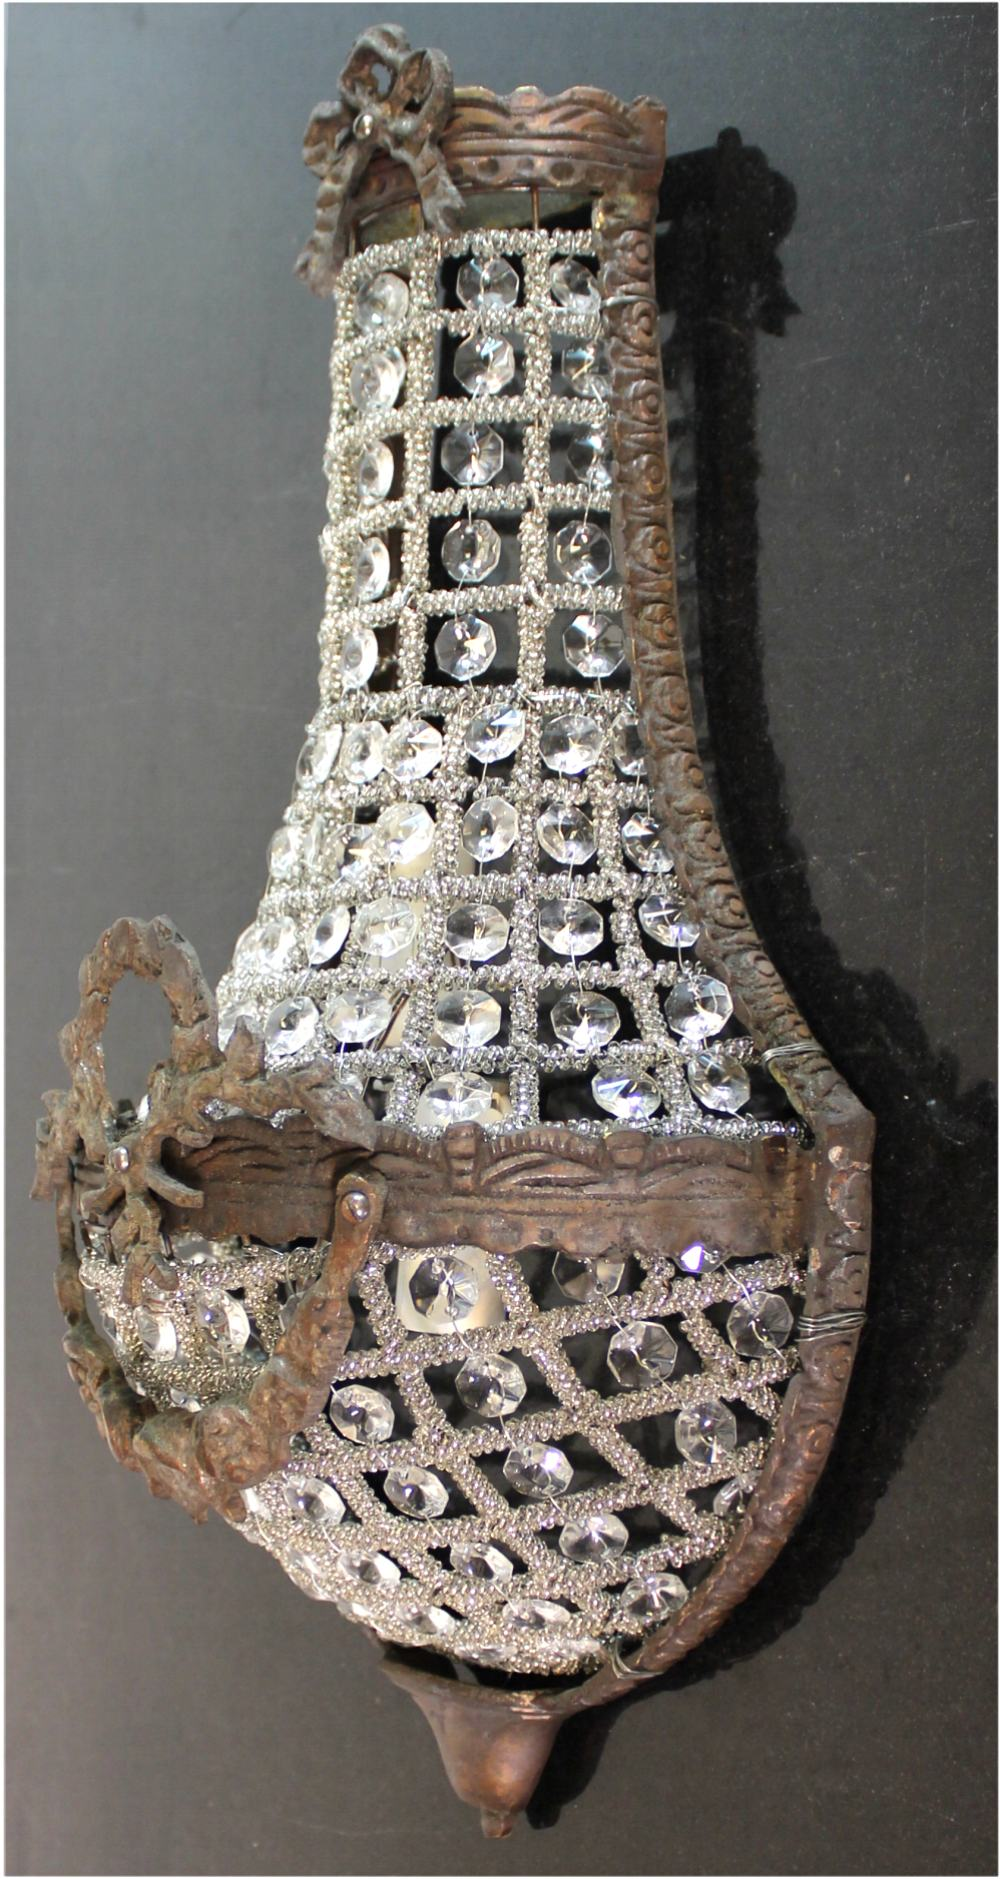 European Crystal Antique Replica SMALL Wall Sconce Light ... on Small Wall Sconce Light id=44347